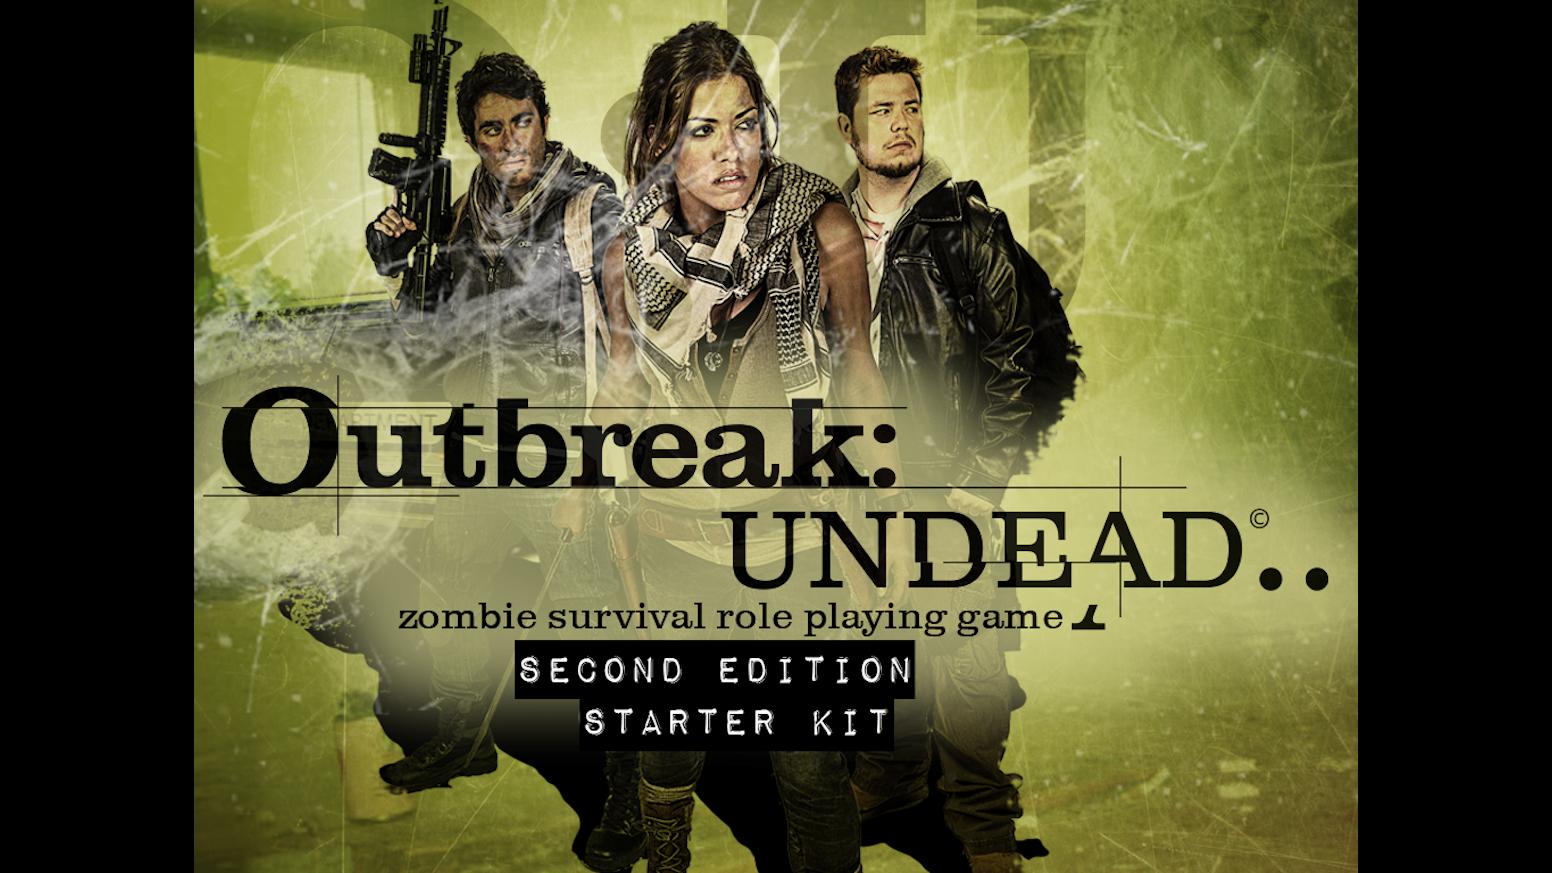 outbreak undead 2nd edition starter kit by hunters books kickstarter. Black Bedroom Furniture Sets. Home Design Ideas